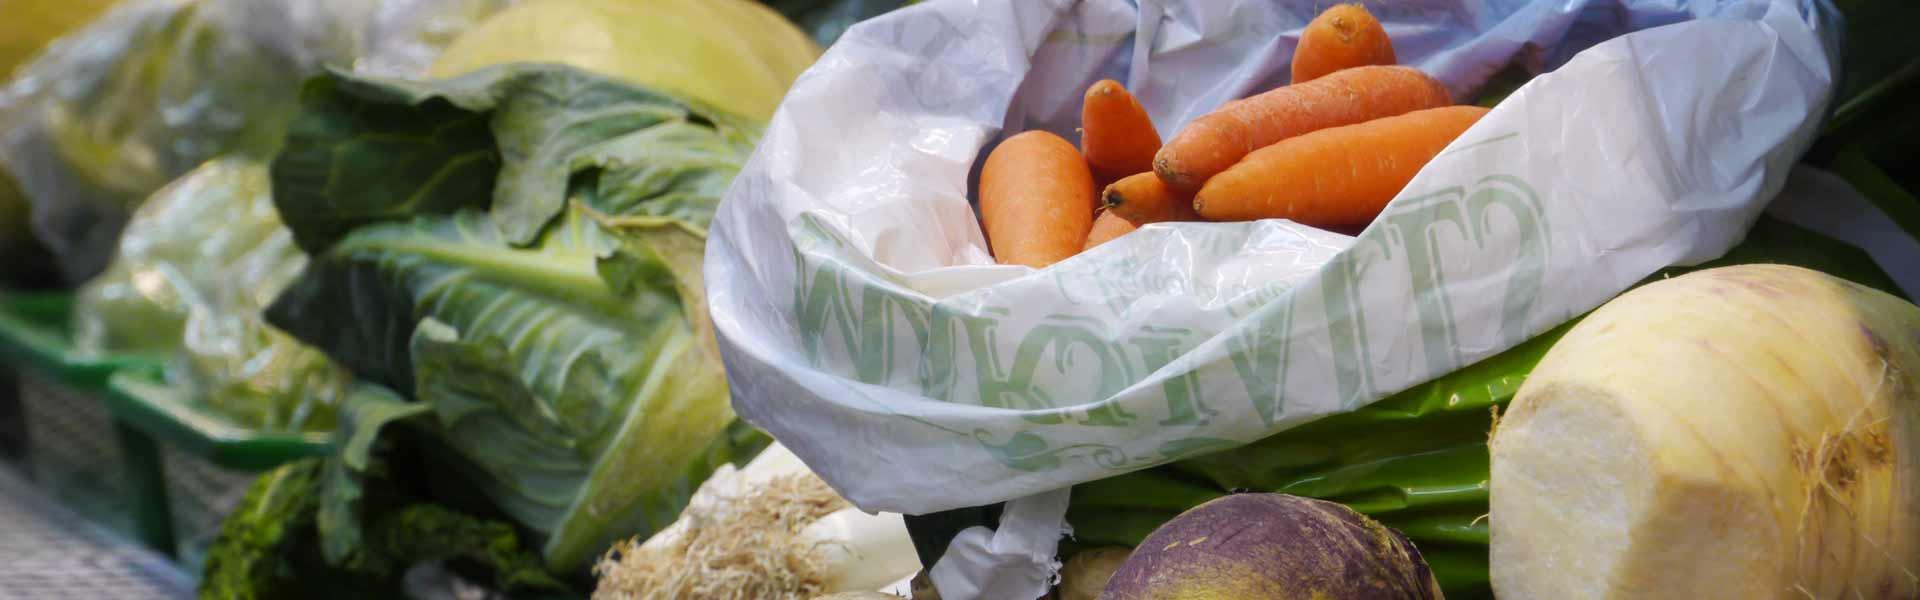 Port Appin Stores - fresh fruit & vegetables delivered daily;